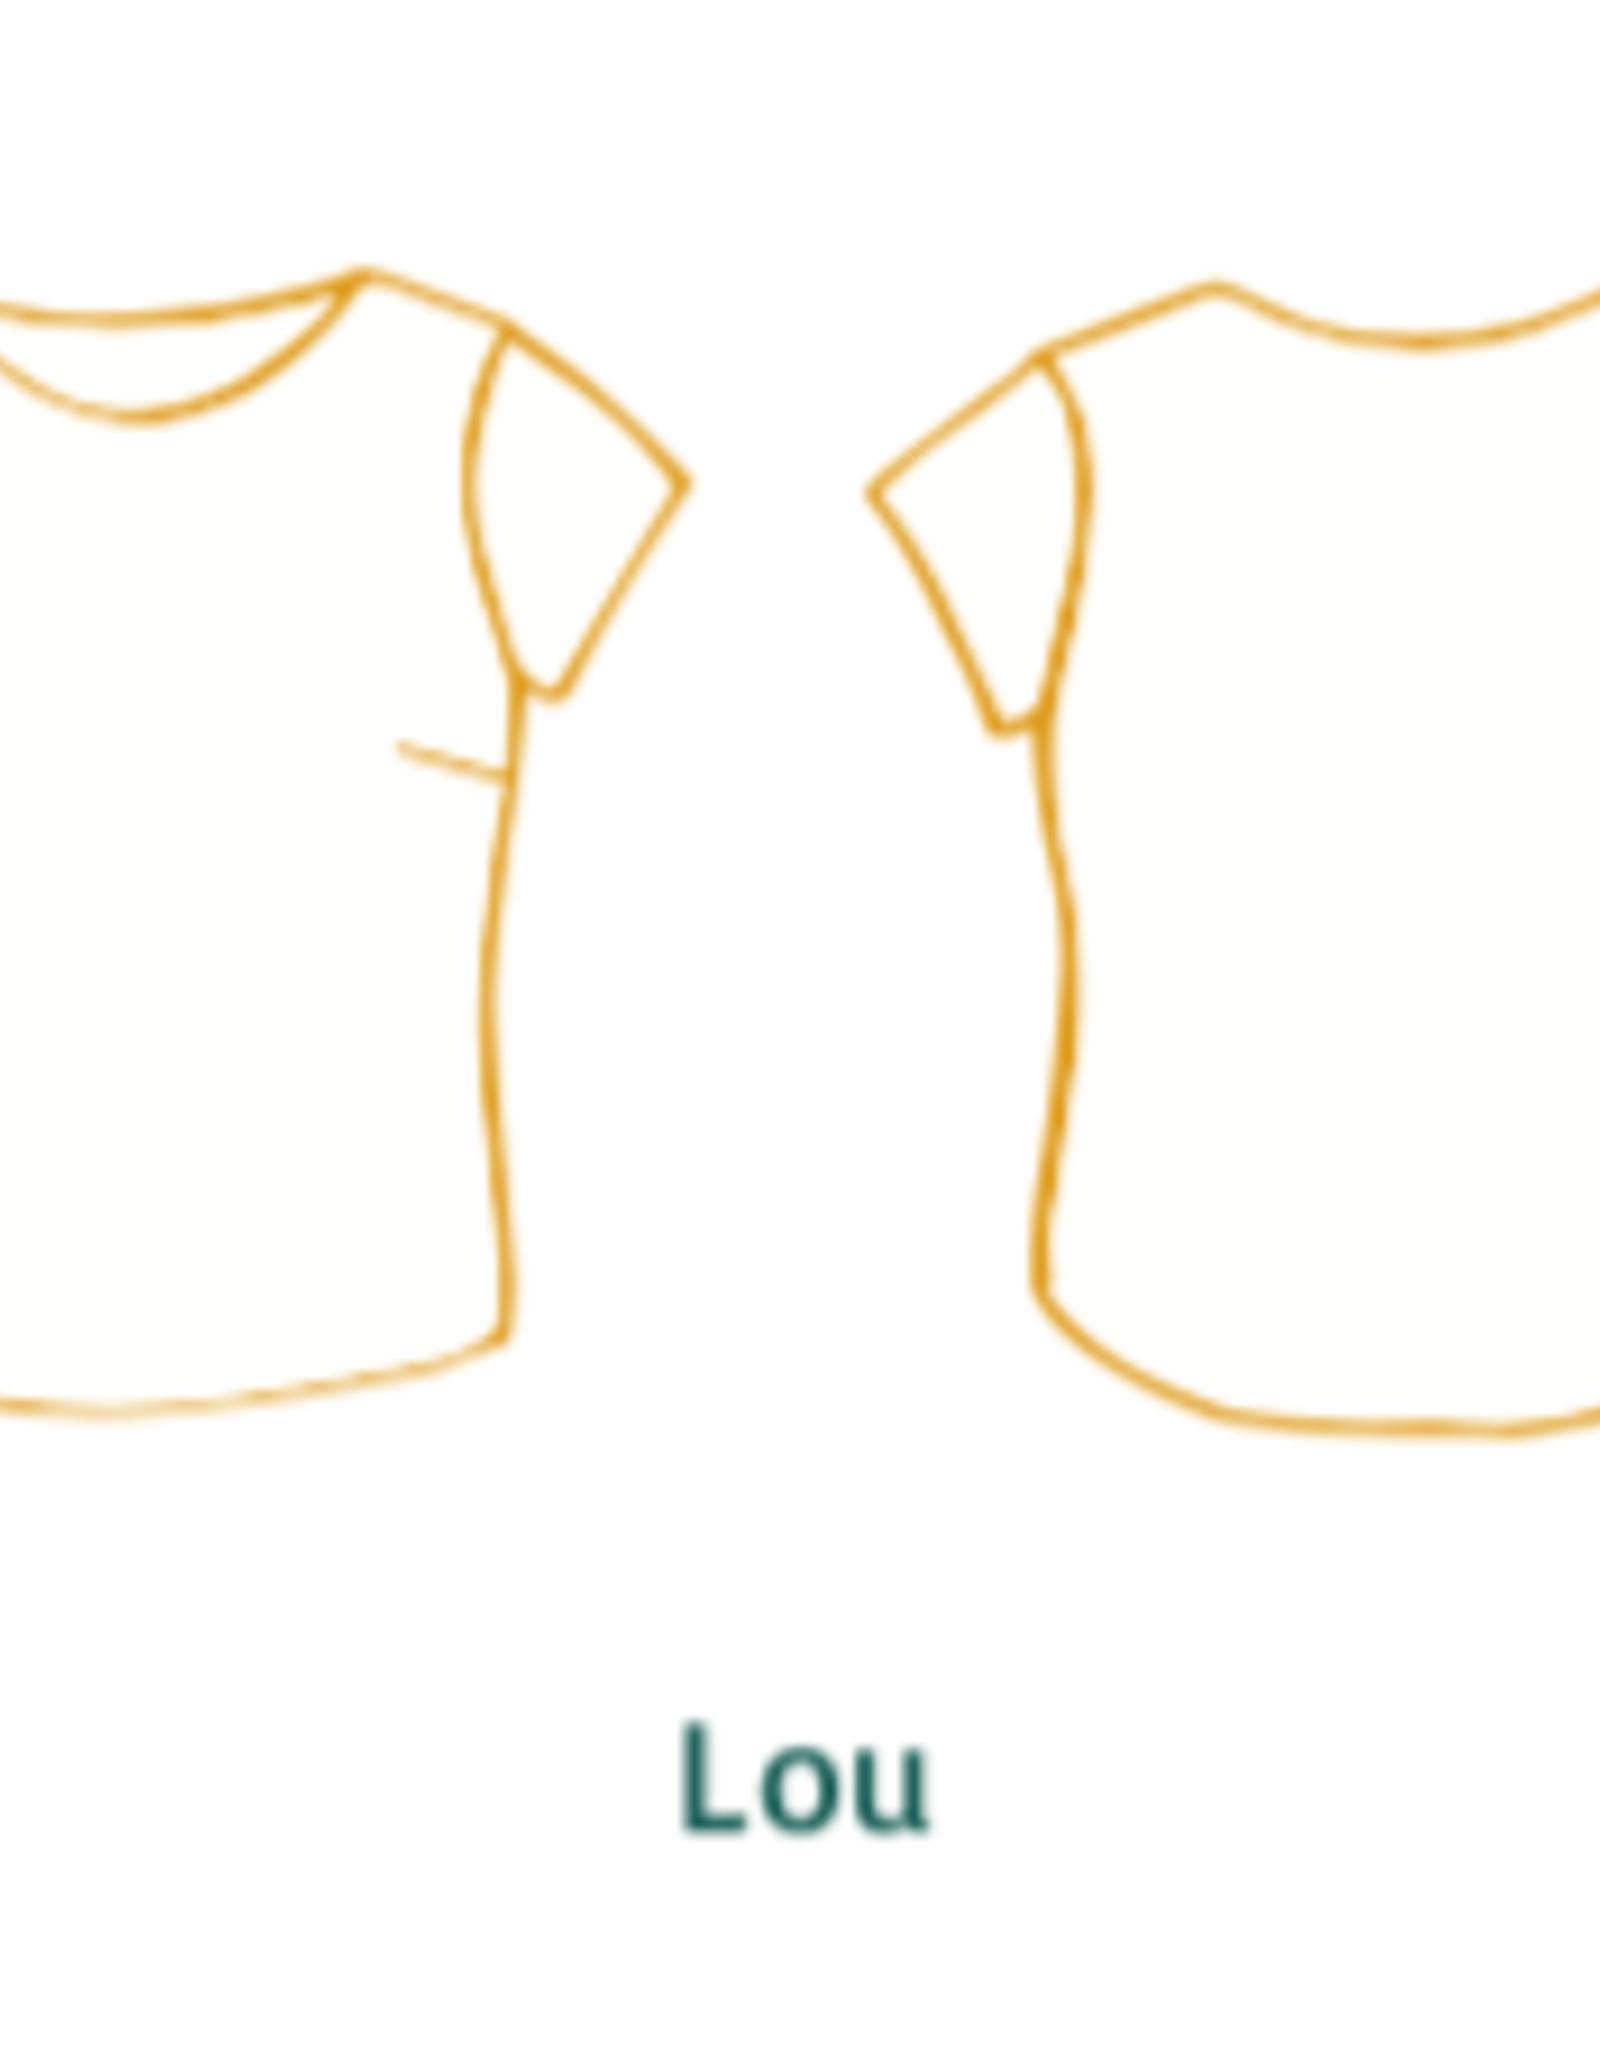 Charlotte en Lou jurk en top